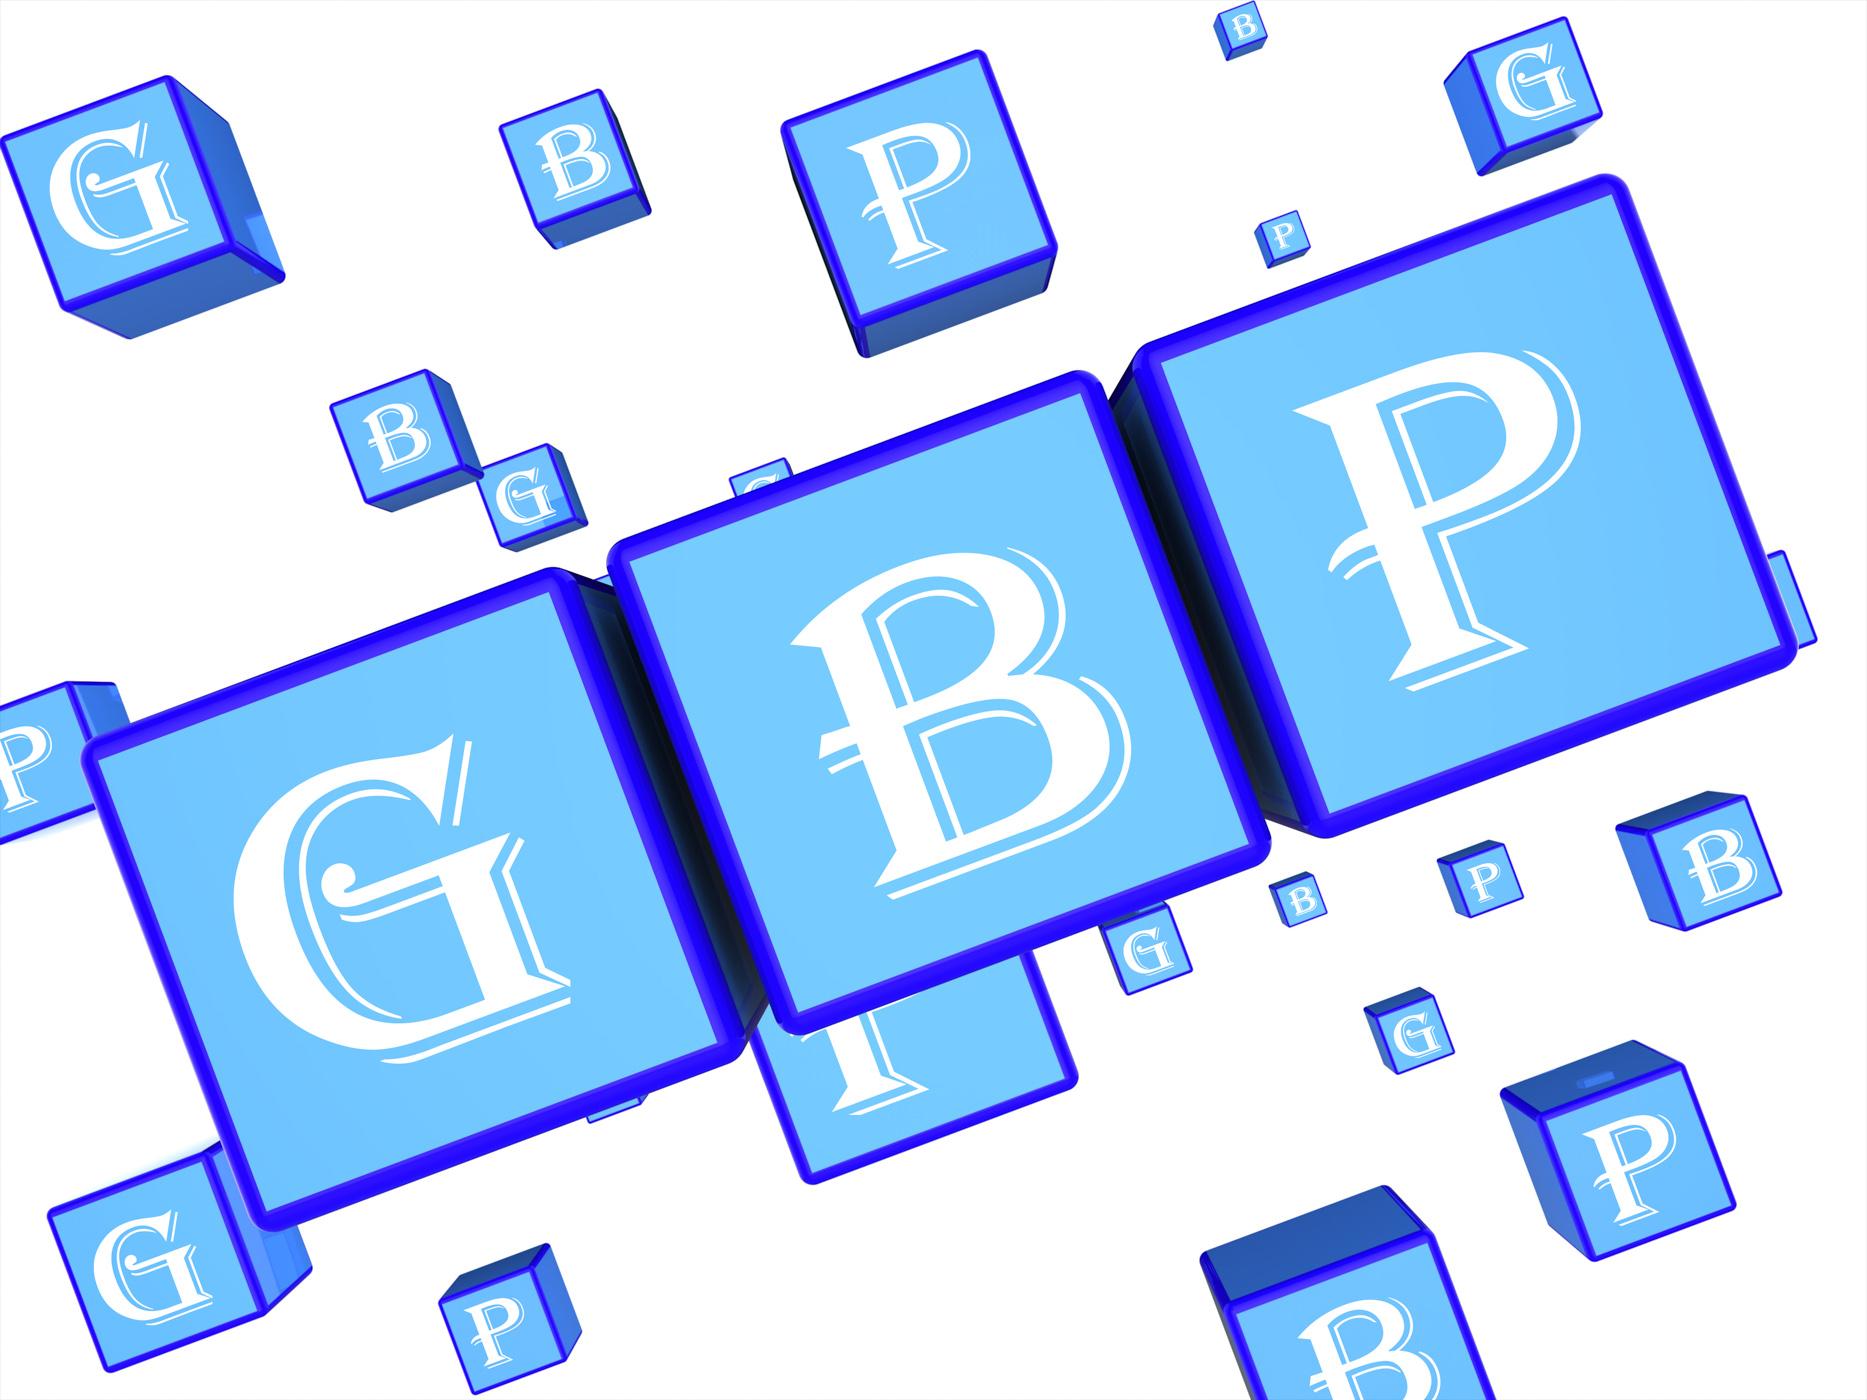 Gbp dice indicates great british pound 3d illustration photo